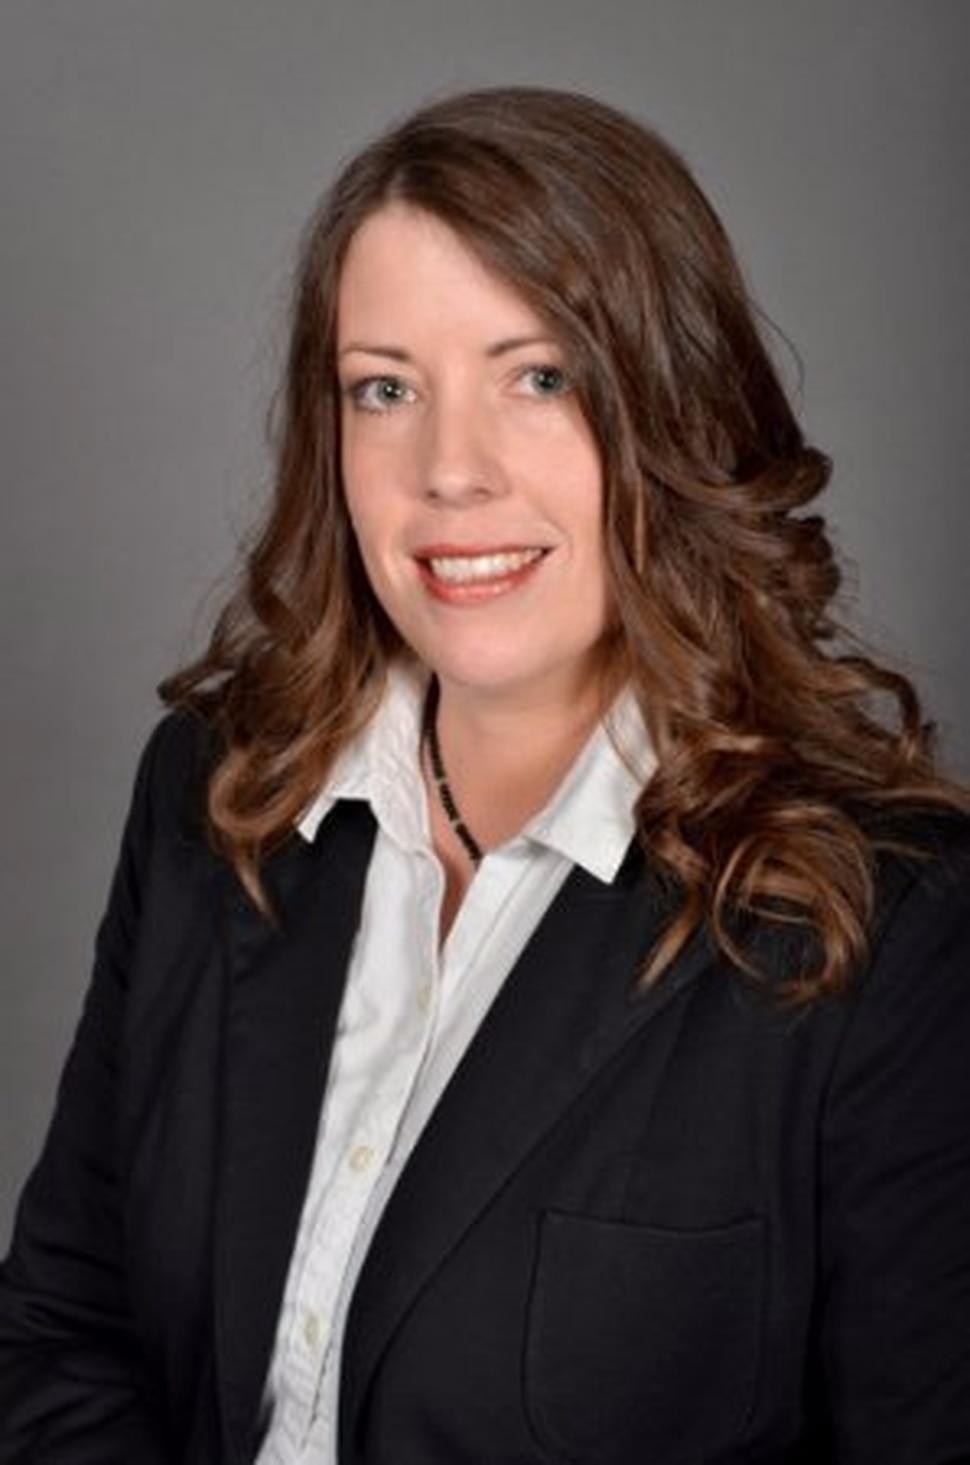 Suzanne Catlett